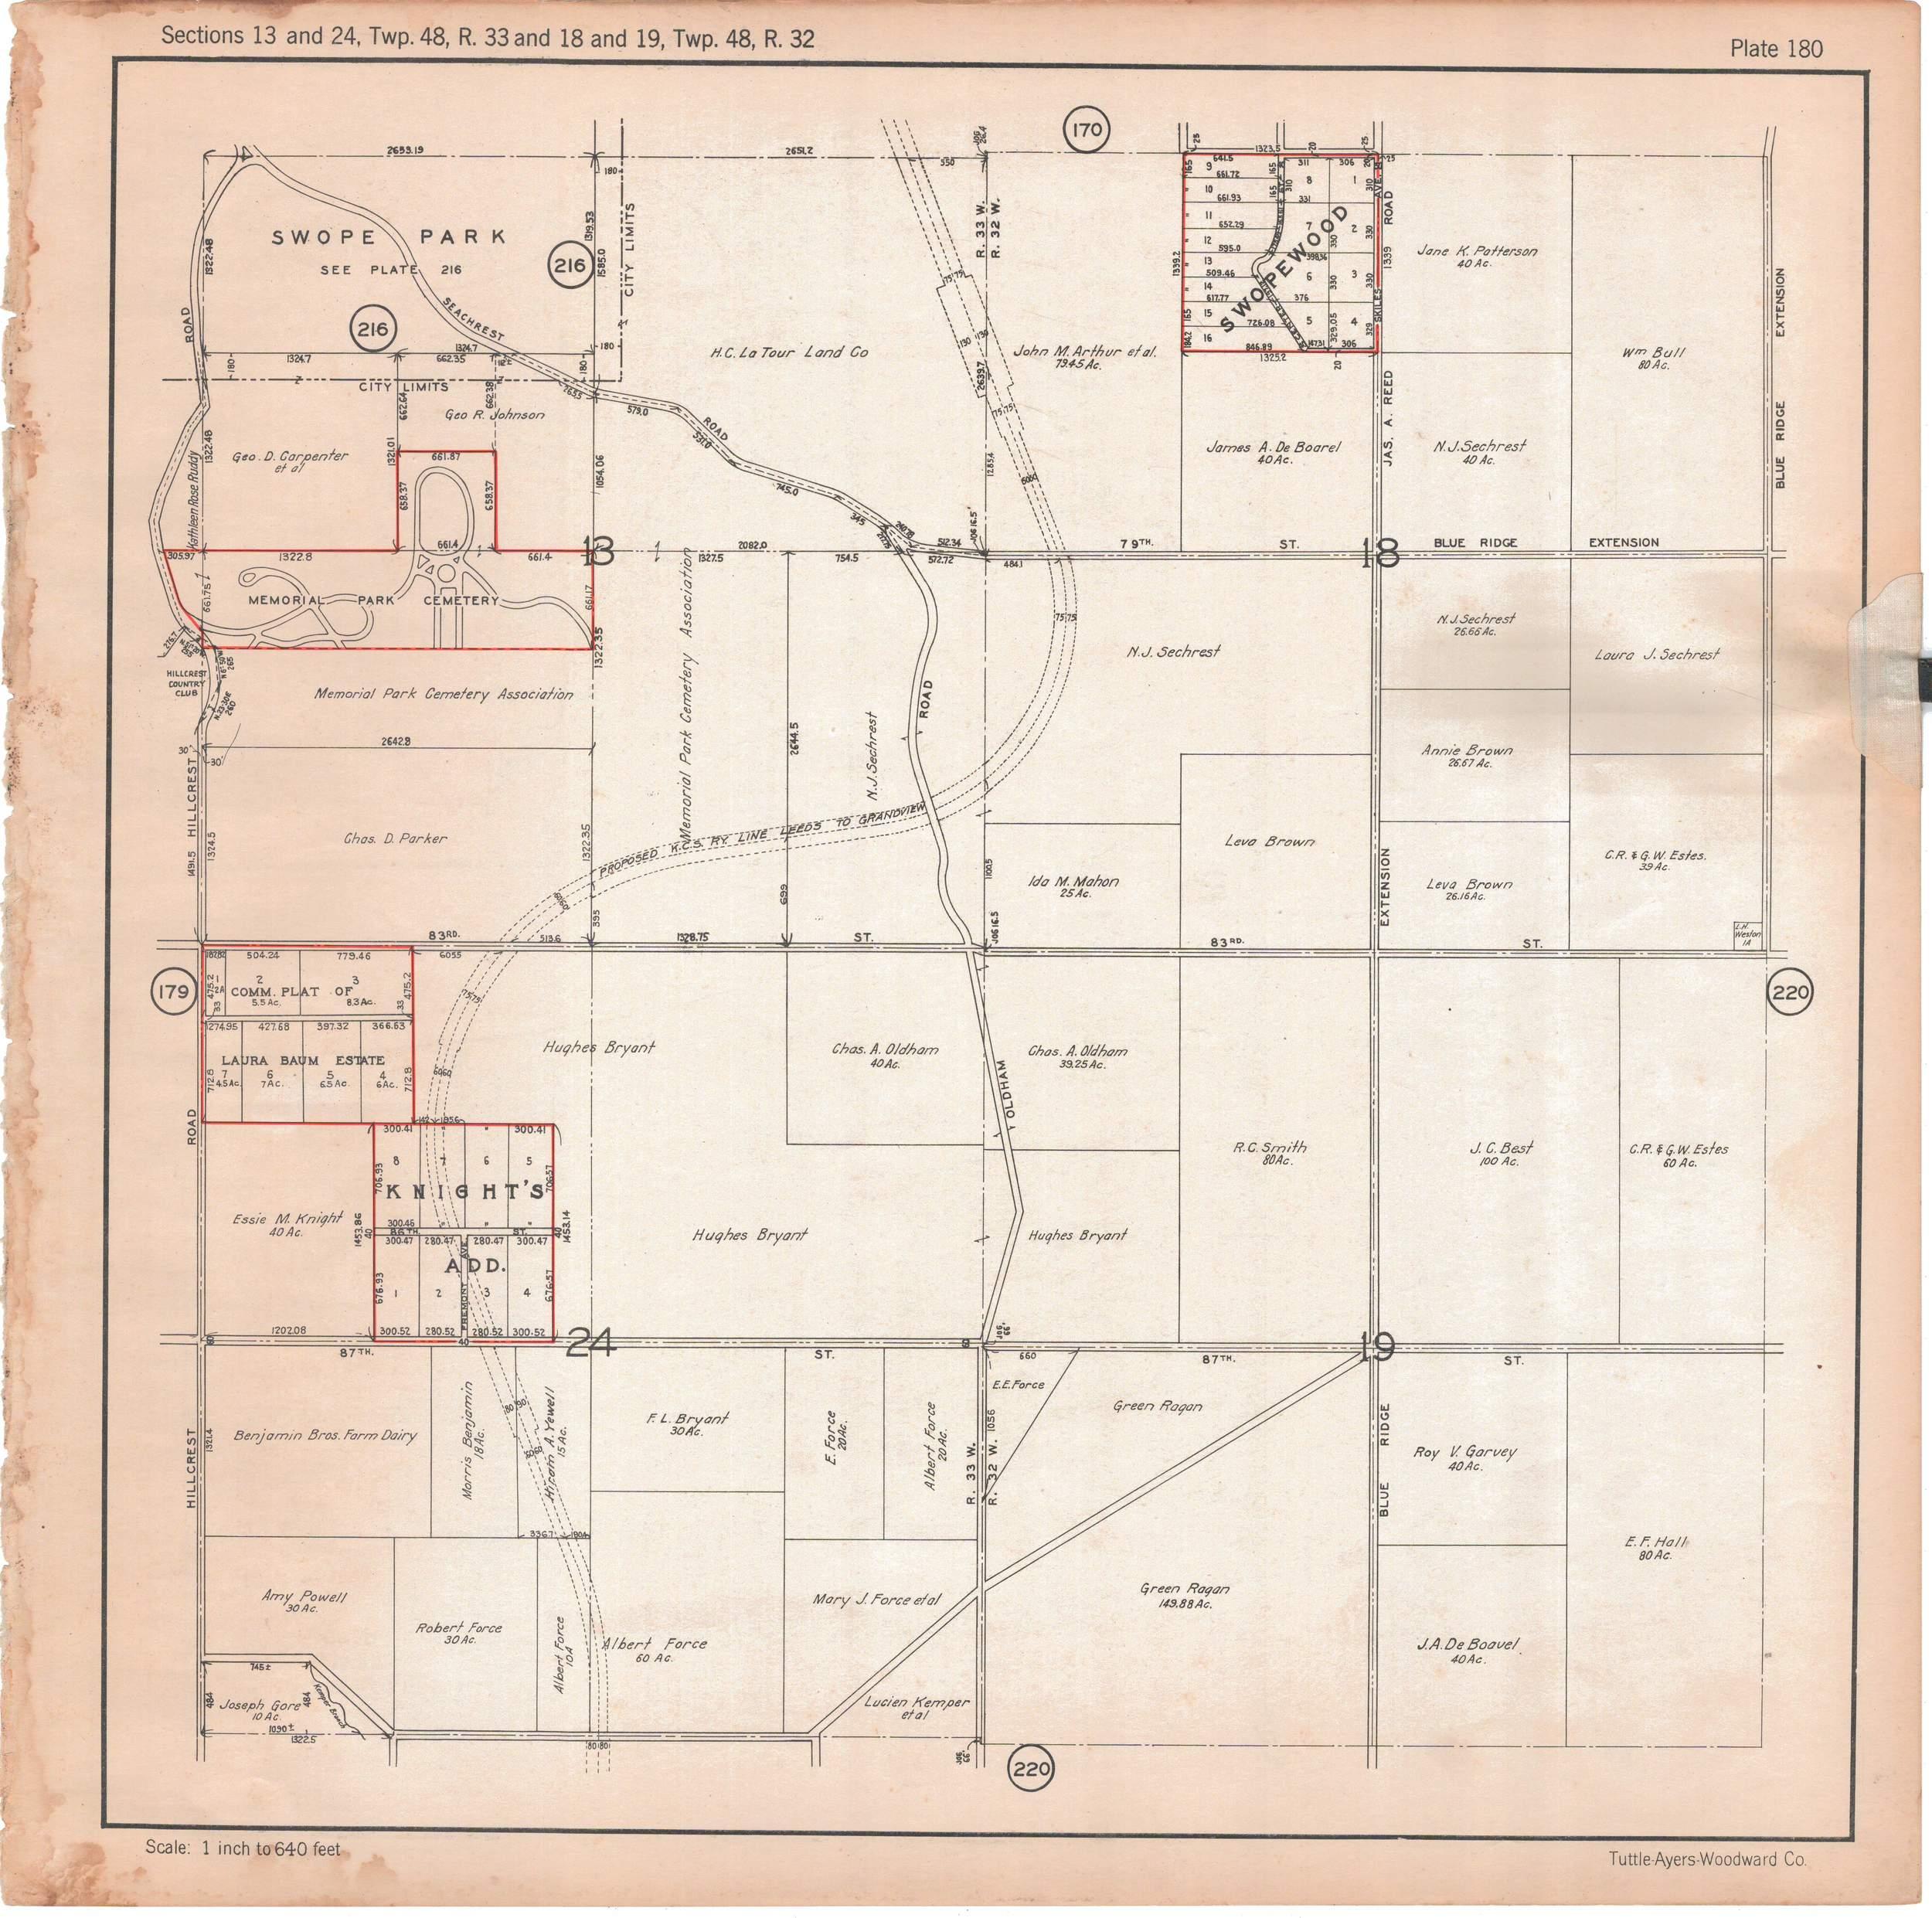 1925 TUTTLE_AYERS_Plate_180.JPG